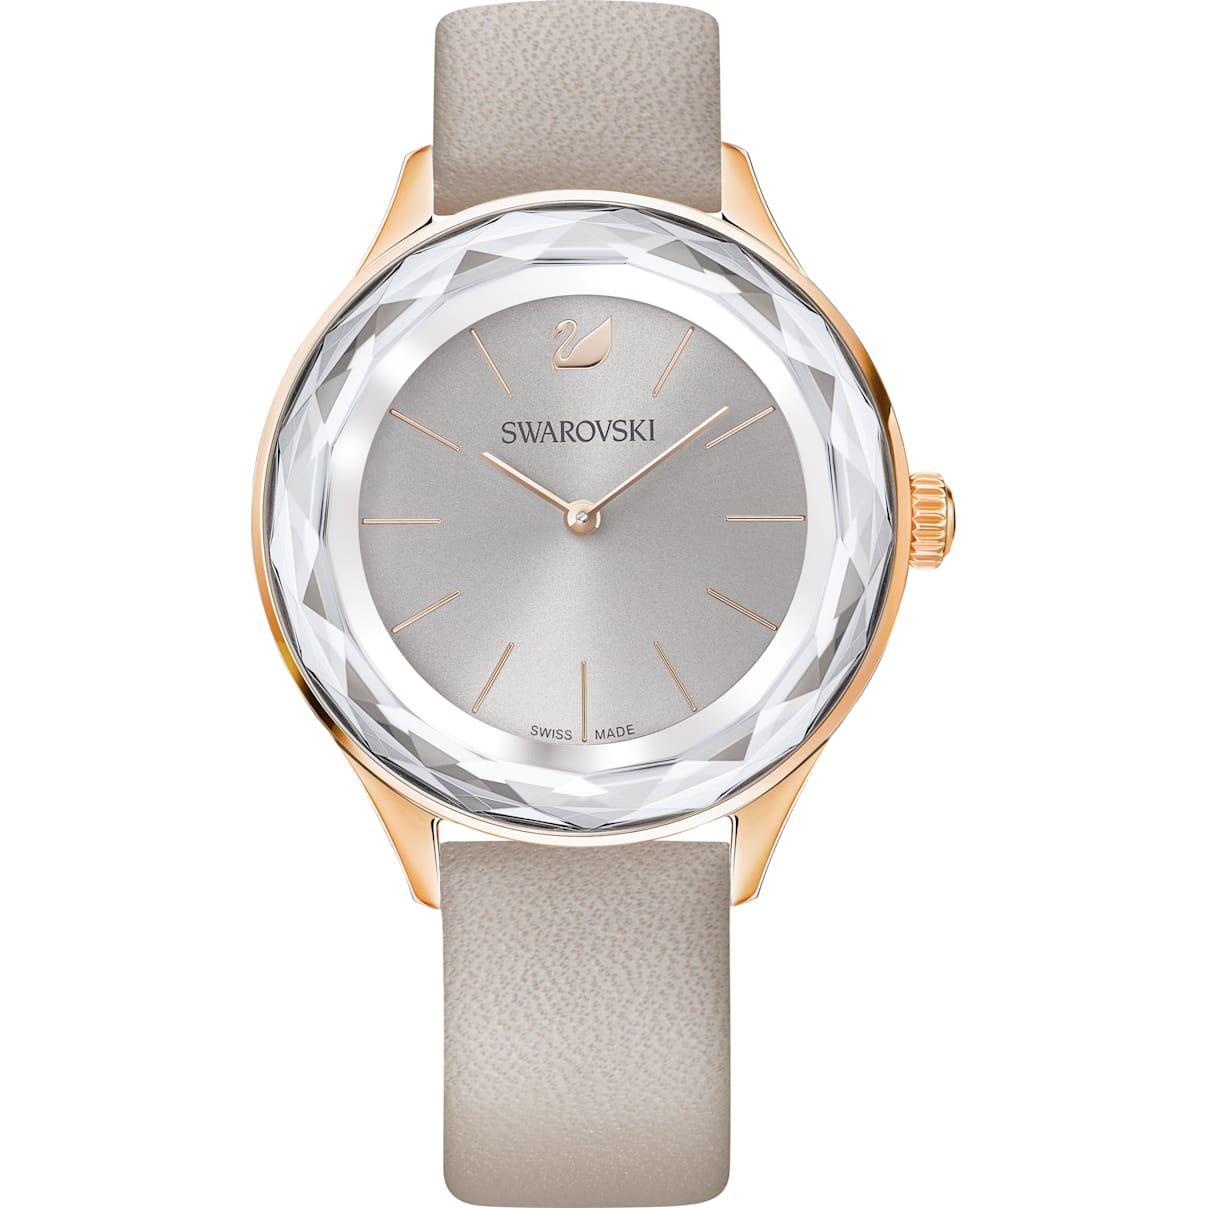 Swarovski Octea Nova Watch, Leather strap, Gray, Rose-gold tone PVD